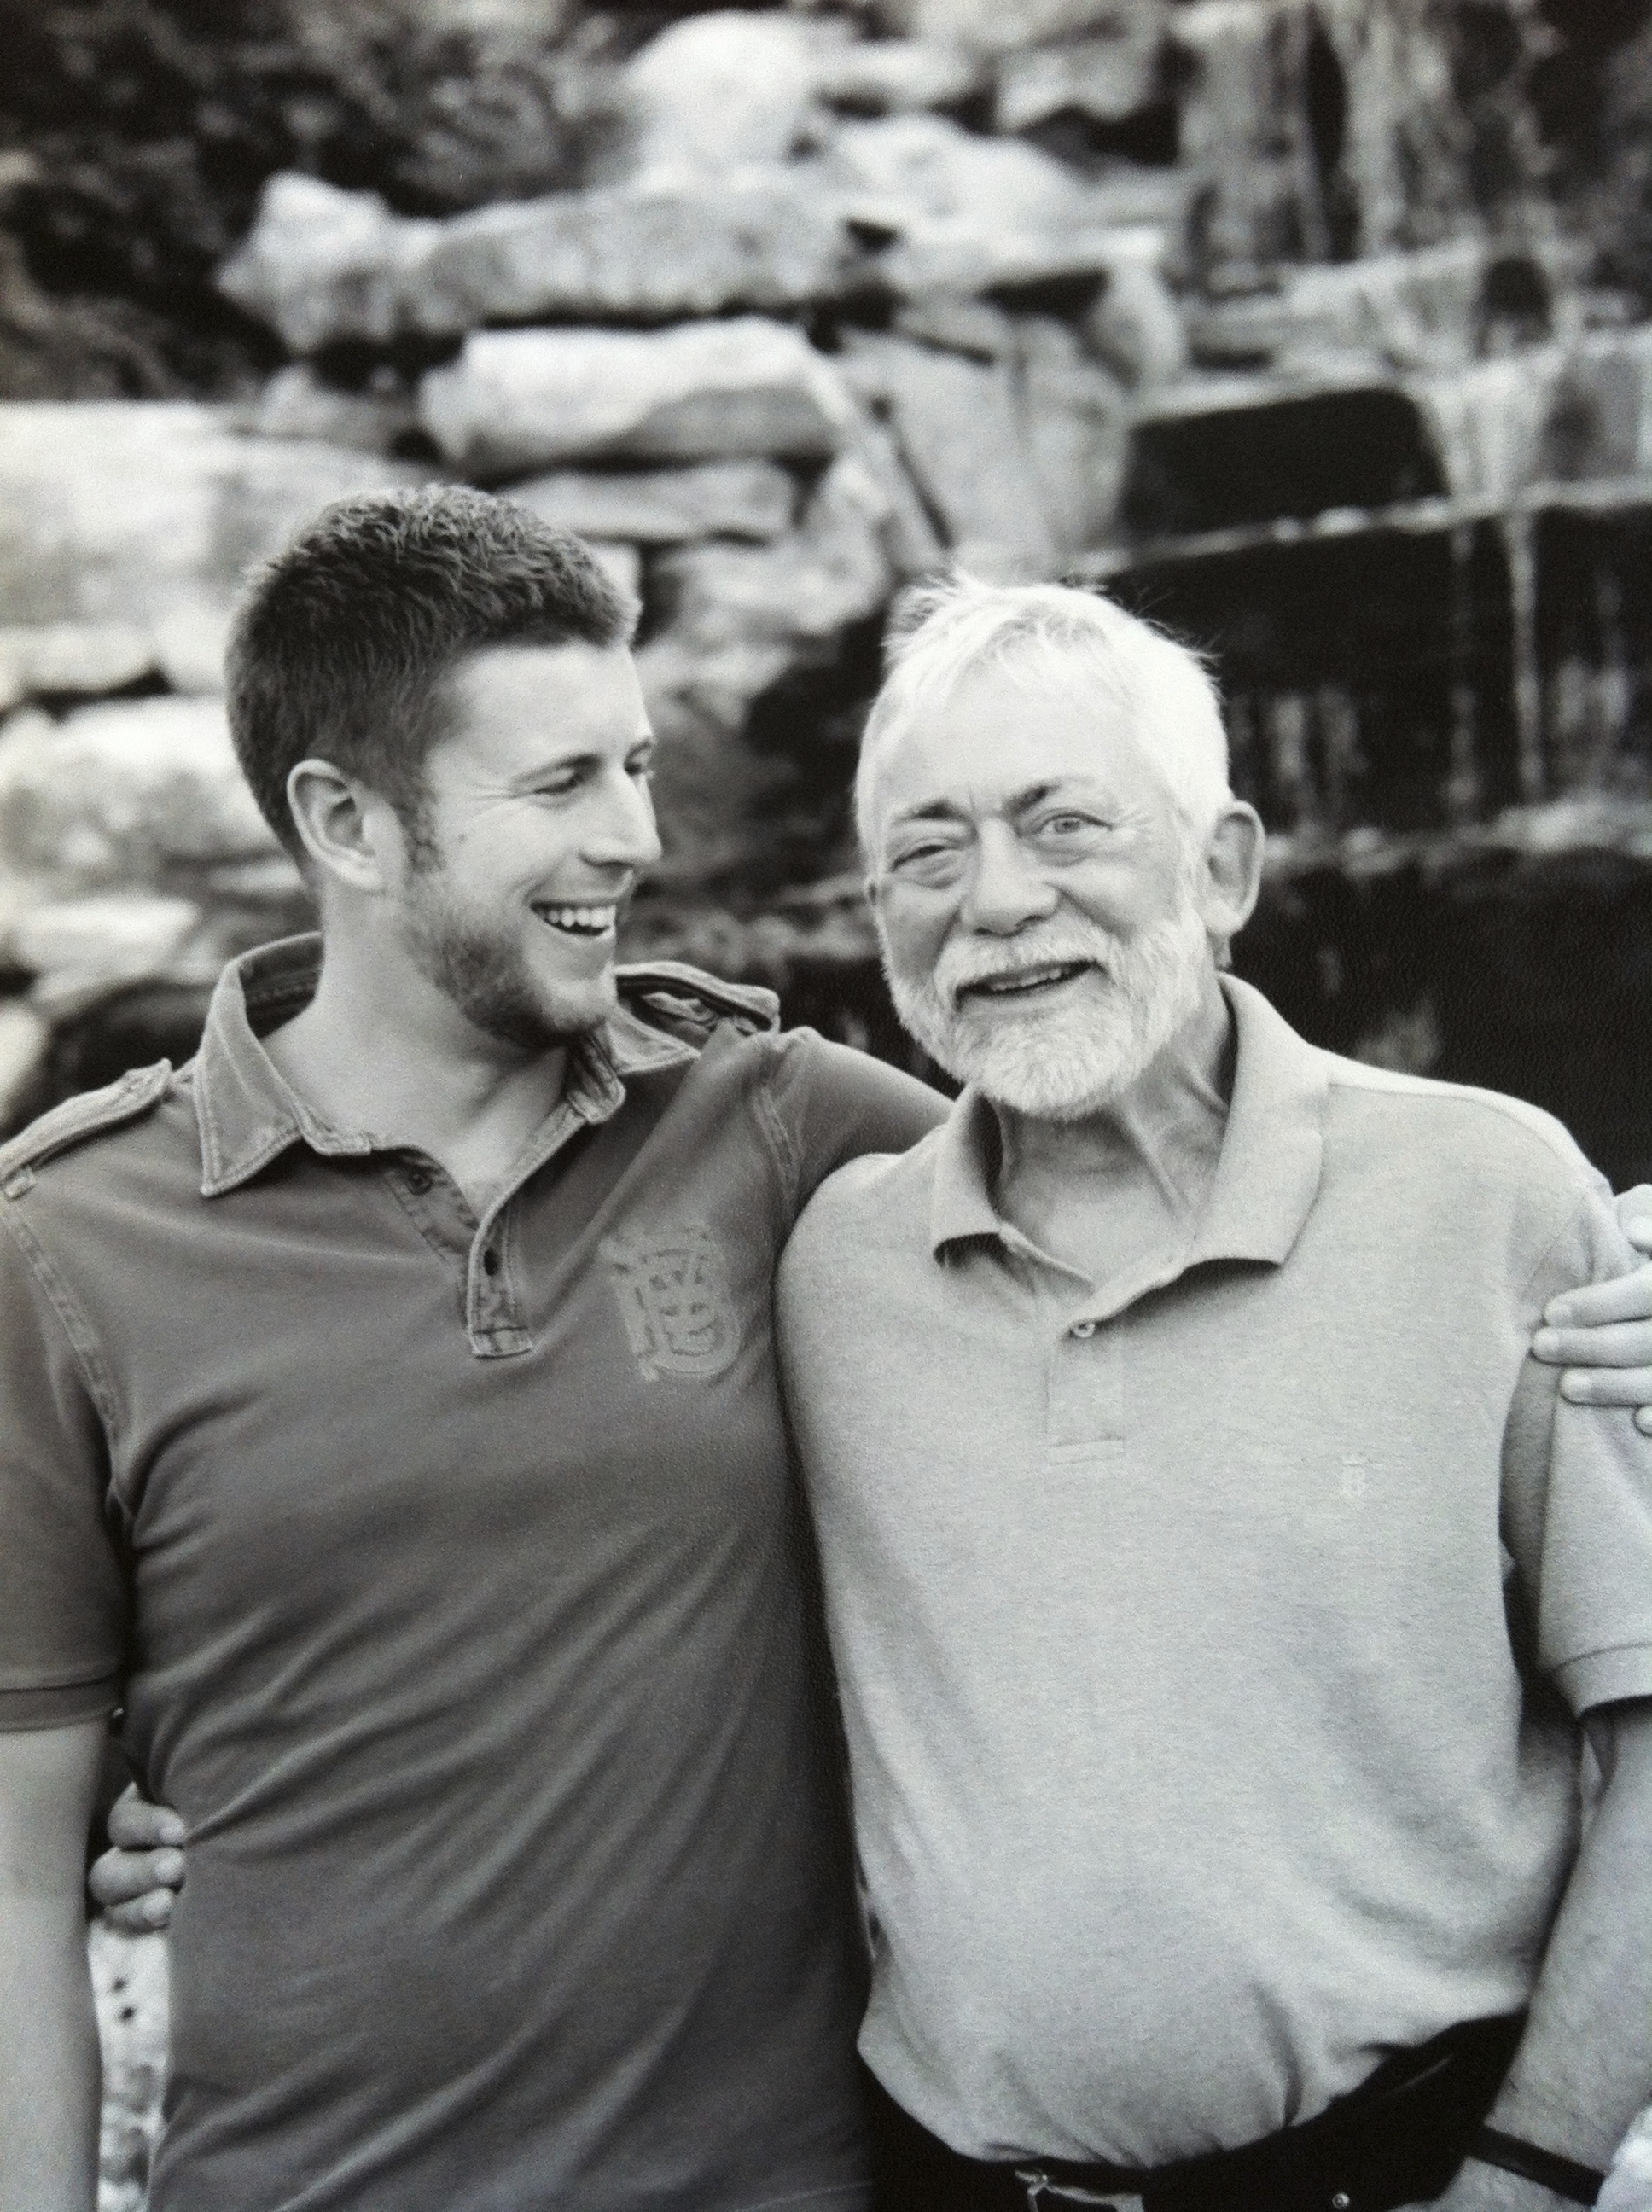 Thomas Daniel with Father, 2012